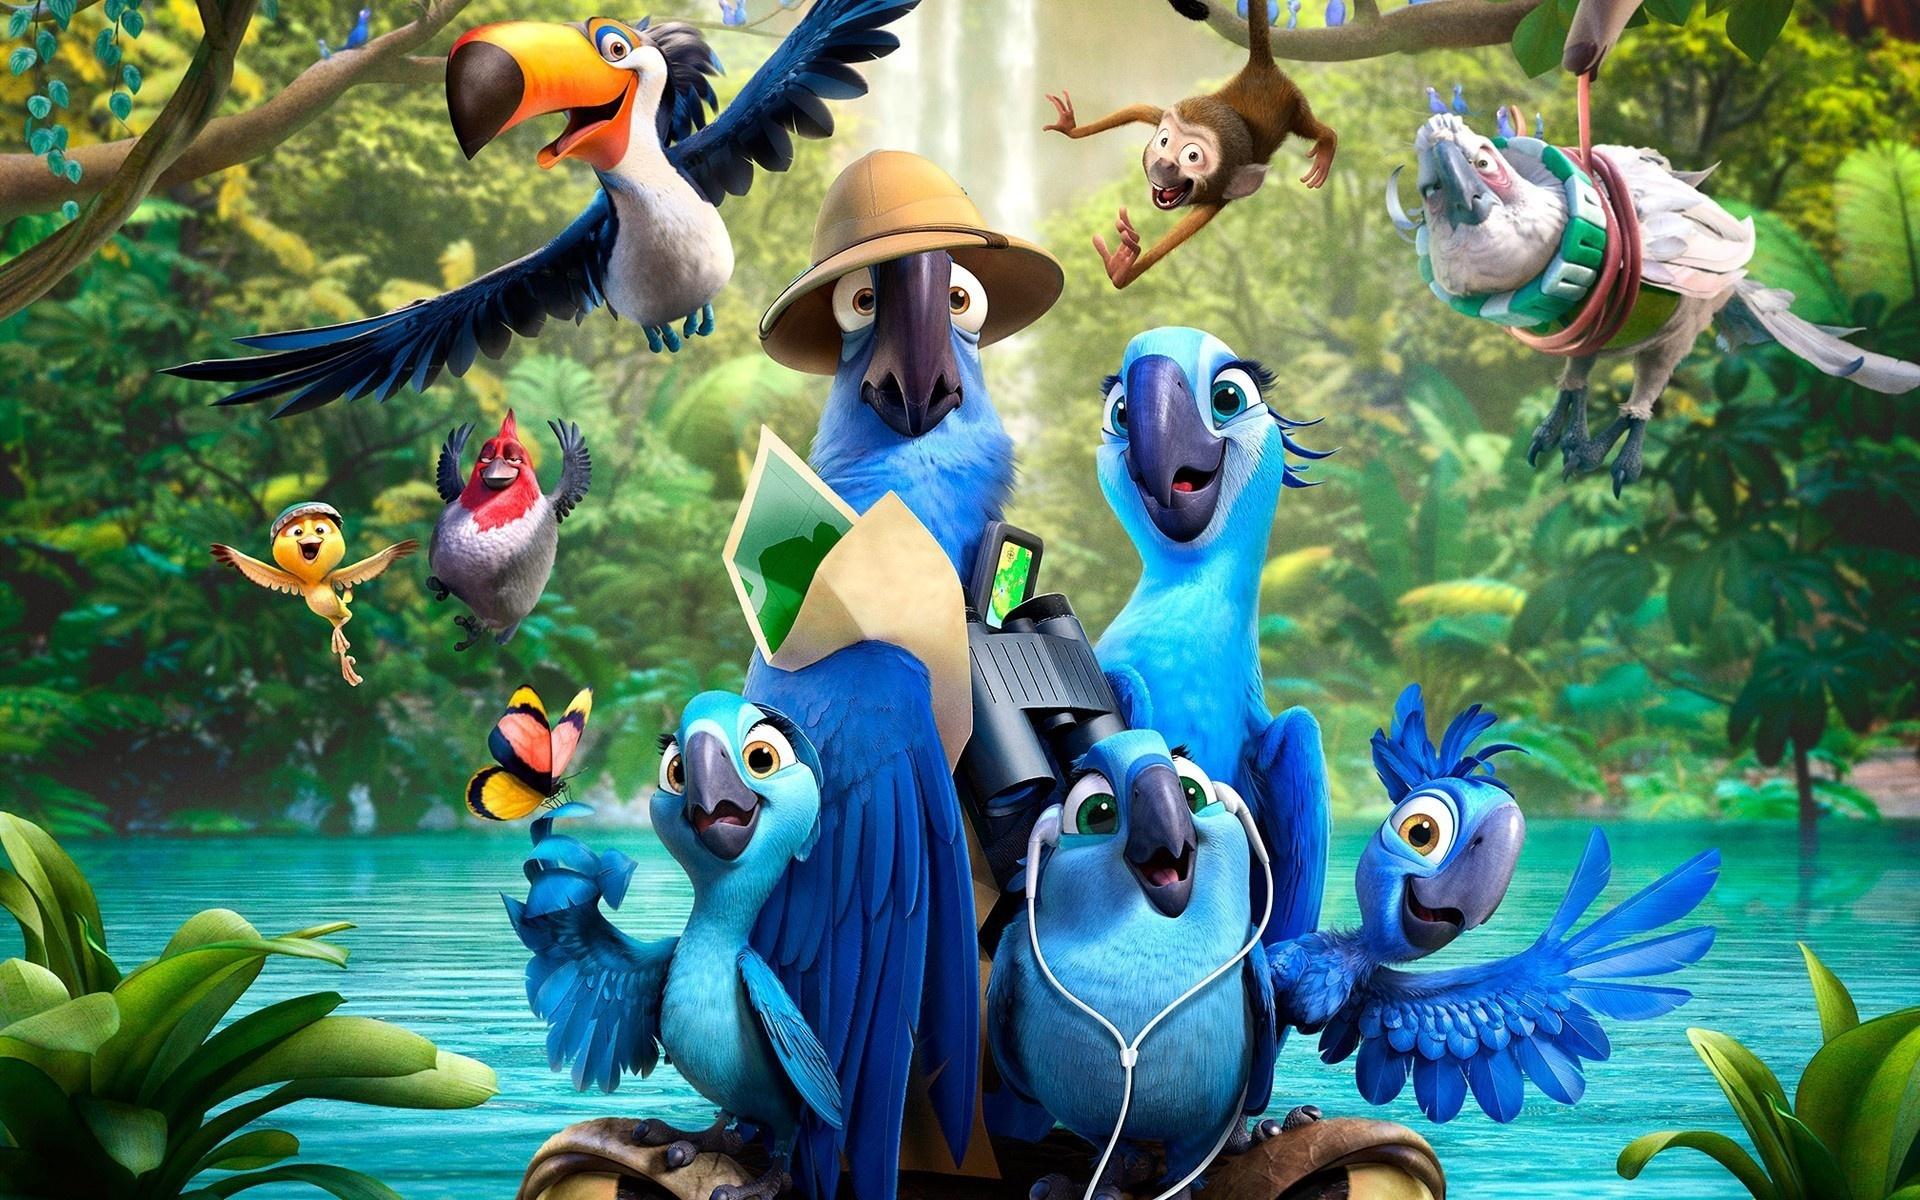 картинки из рио все птицы коридоре нём позже